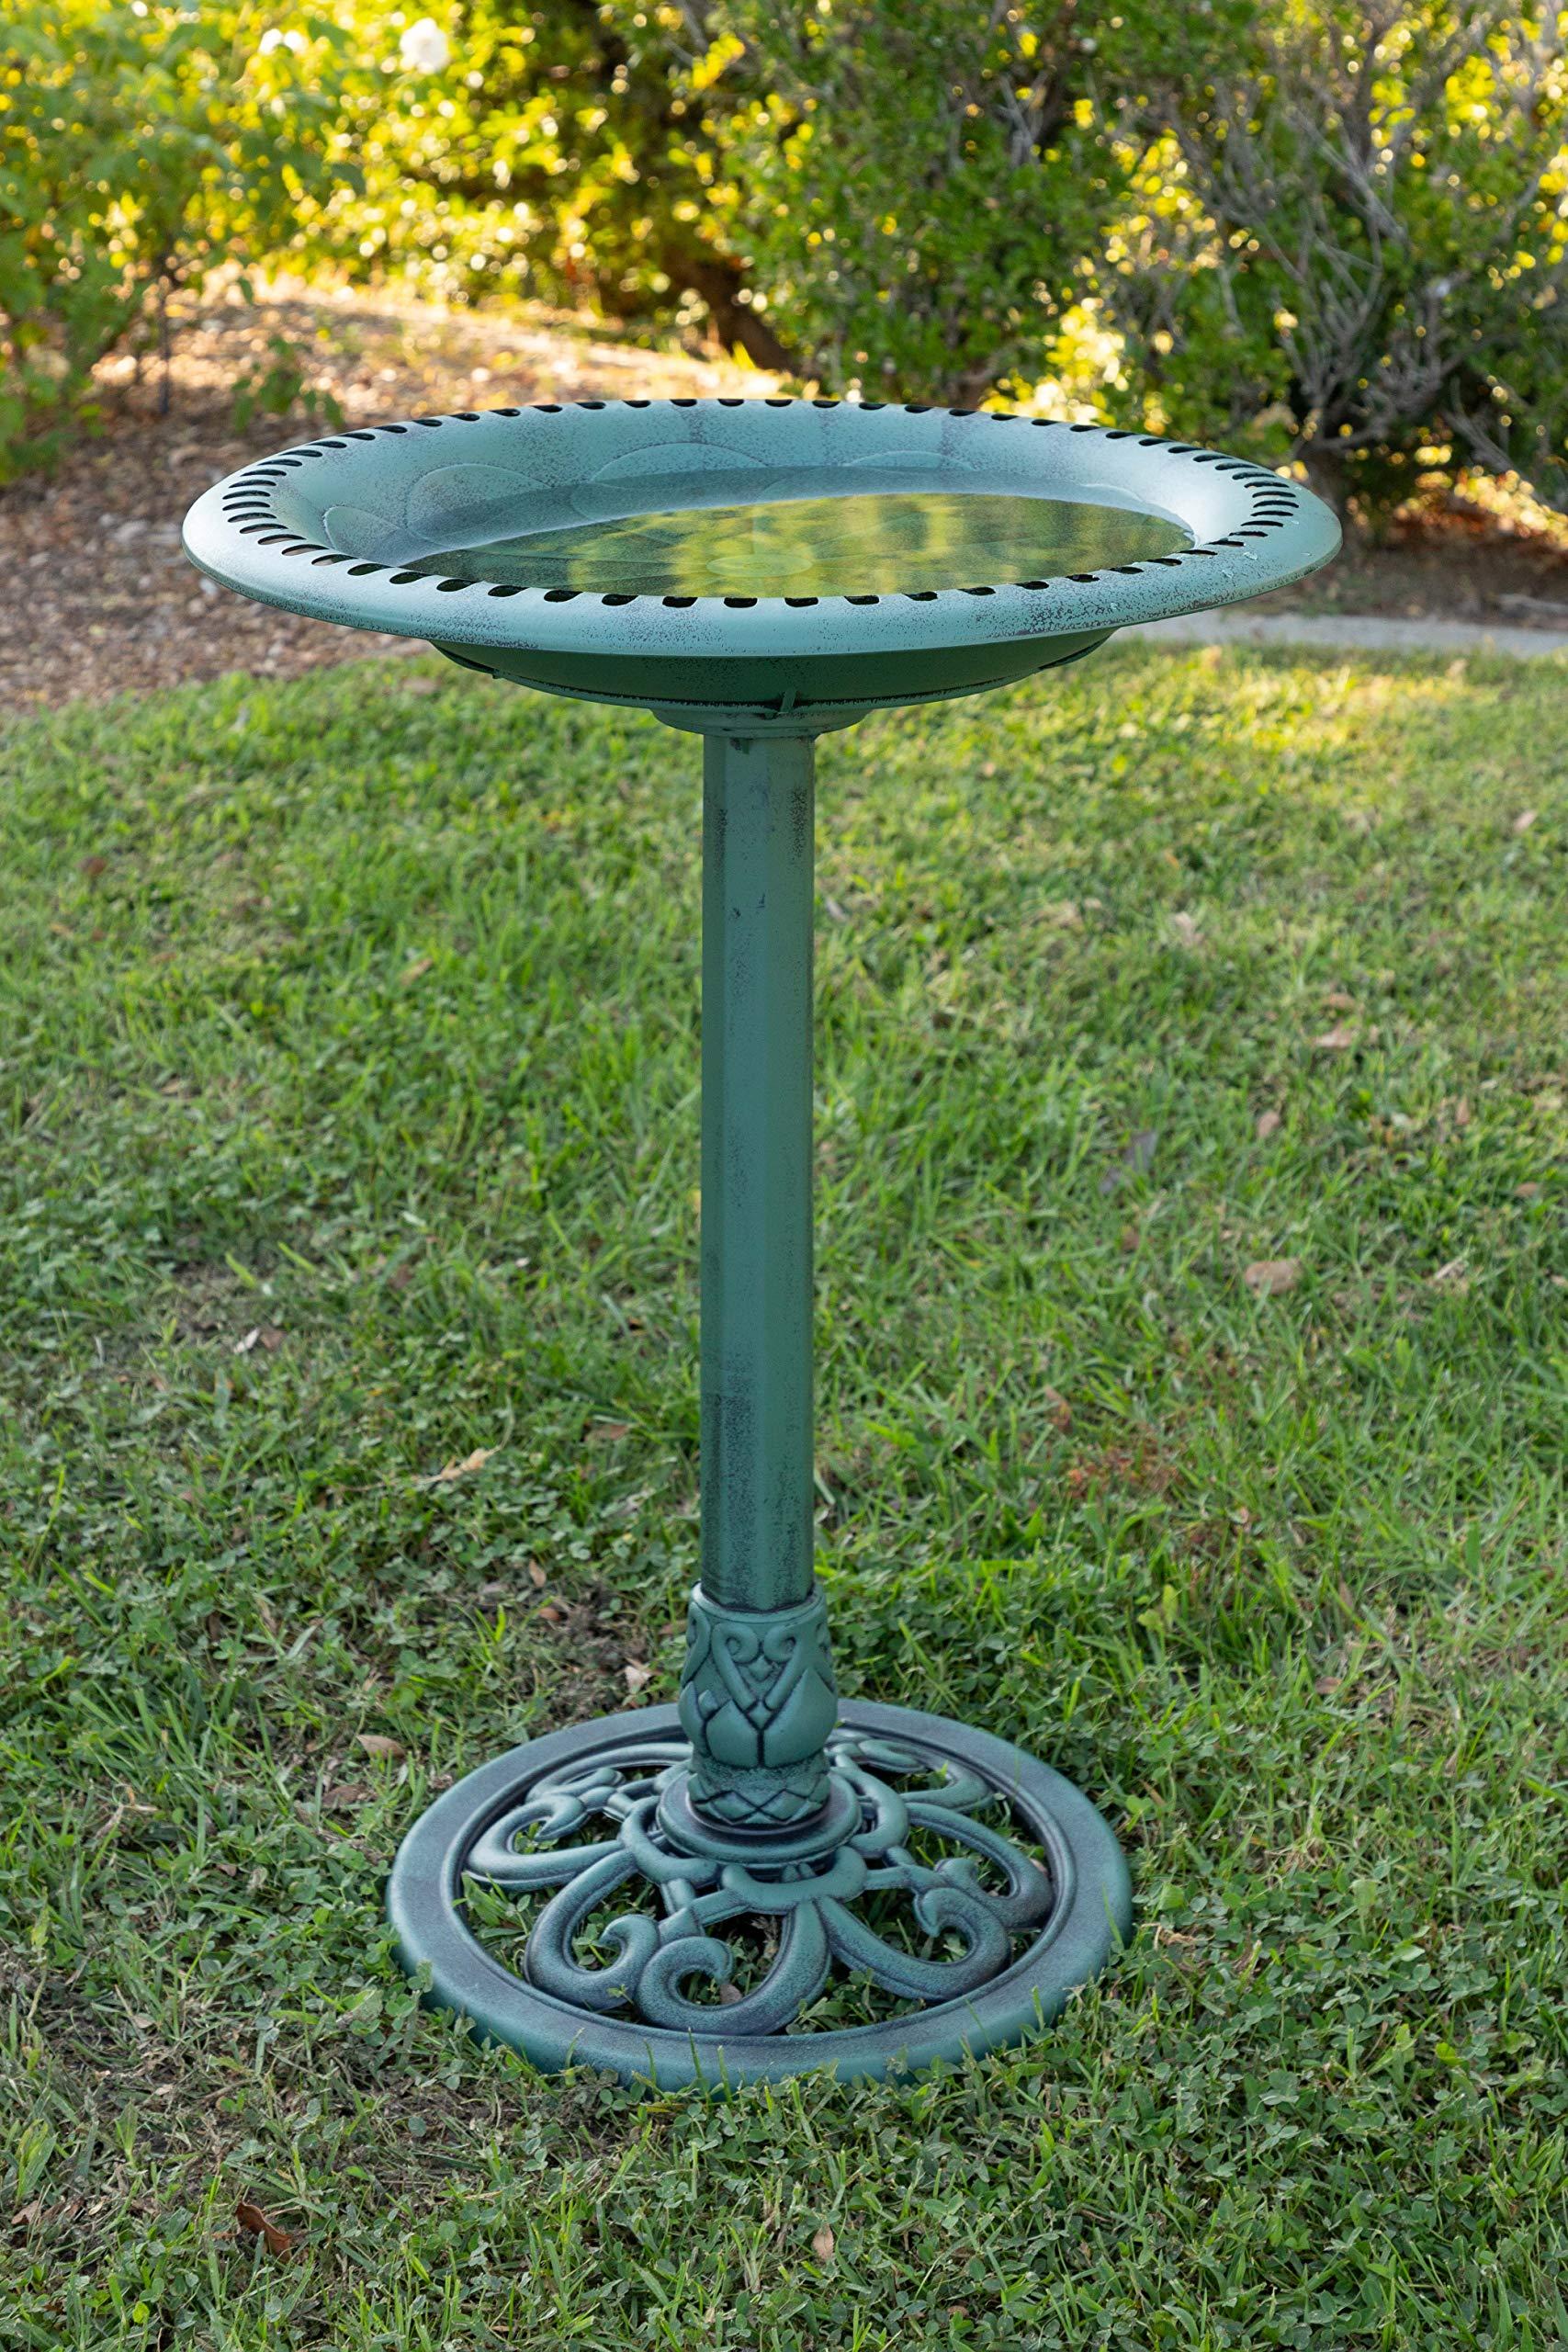 Alpine Corporation Plastic Birdbath with Scrollwork - Outdoor Decor for Garden, Patio, Deck, Porch - Green